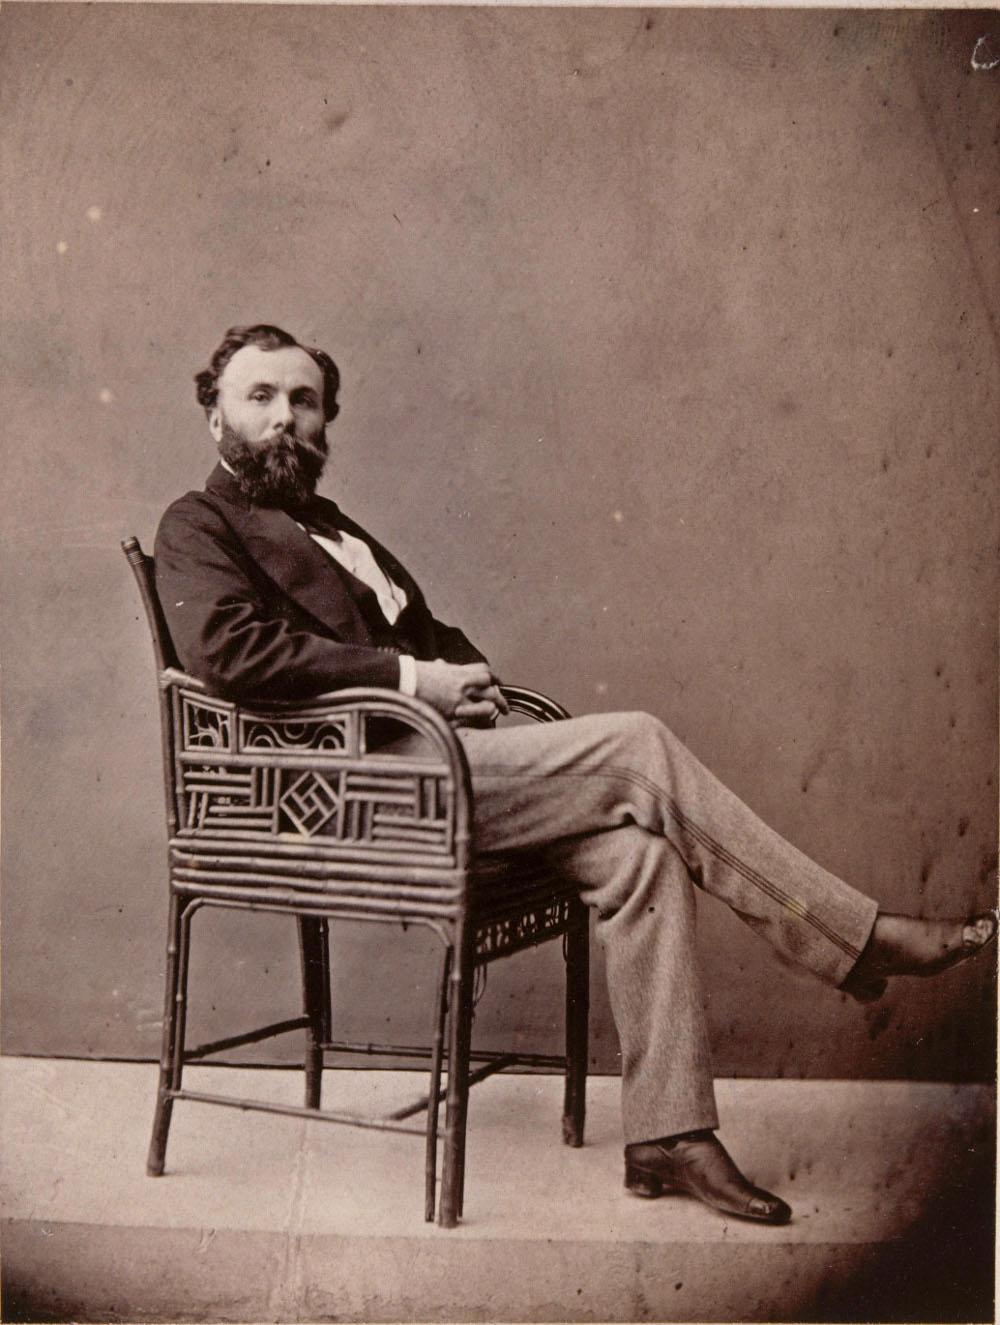 O pintor simbolista Gustave Moreau